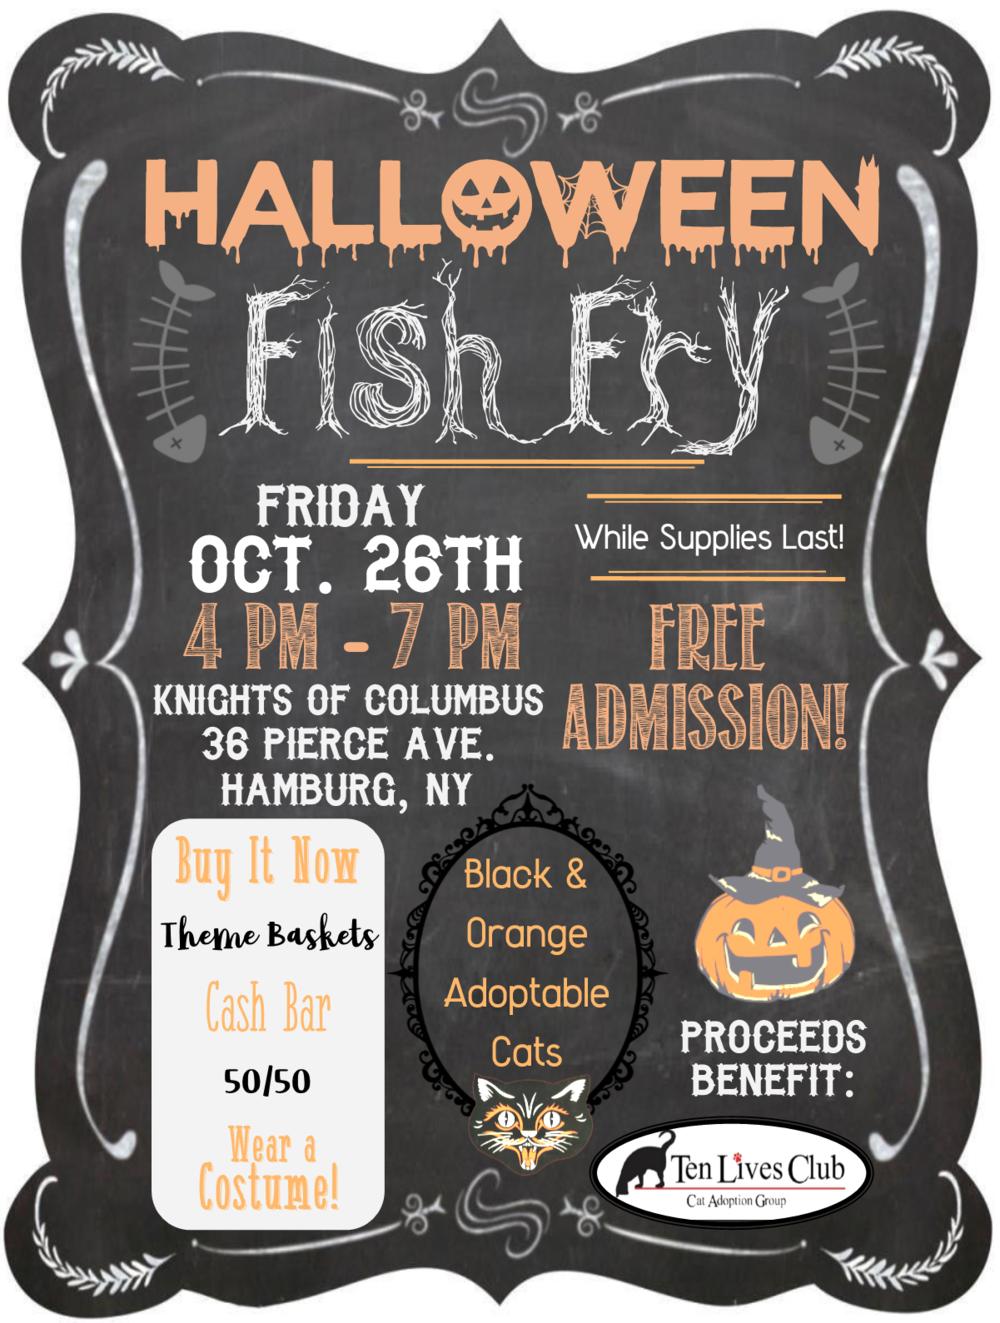 Halloween Fish Fry Flyer.png